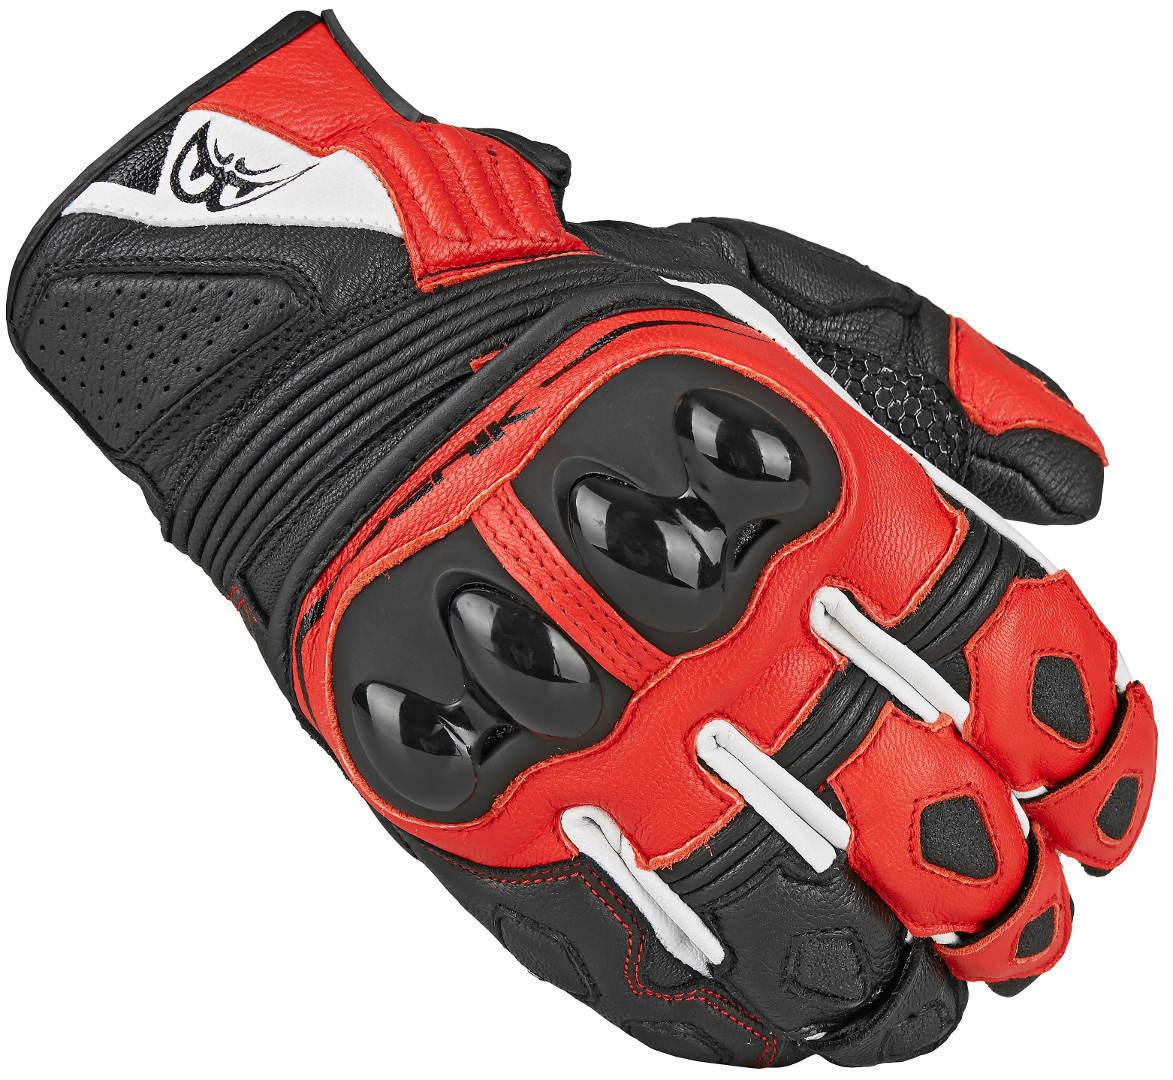 Berik Sprint Motorradhandschuhe, schwarz-rot, Größe XL, schwarz-rot, Größe XL